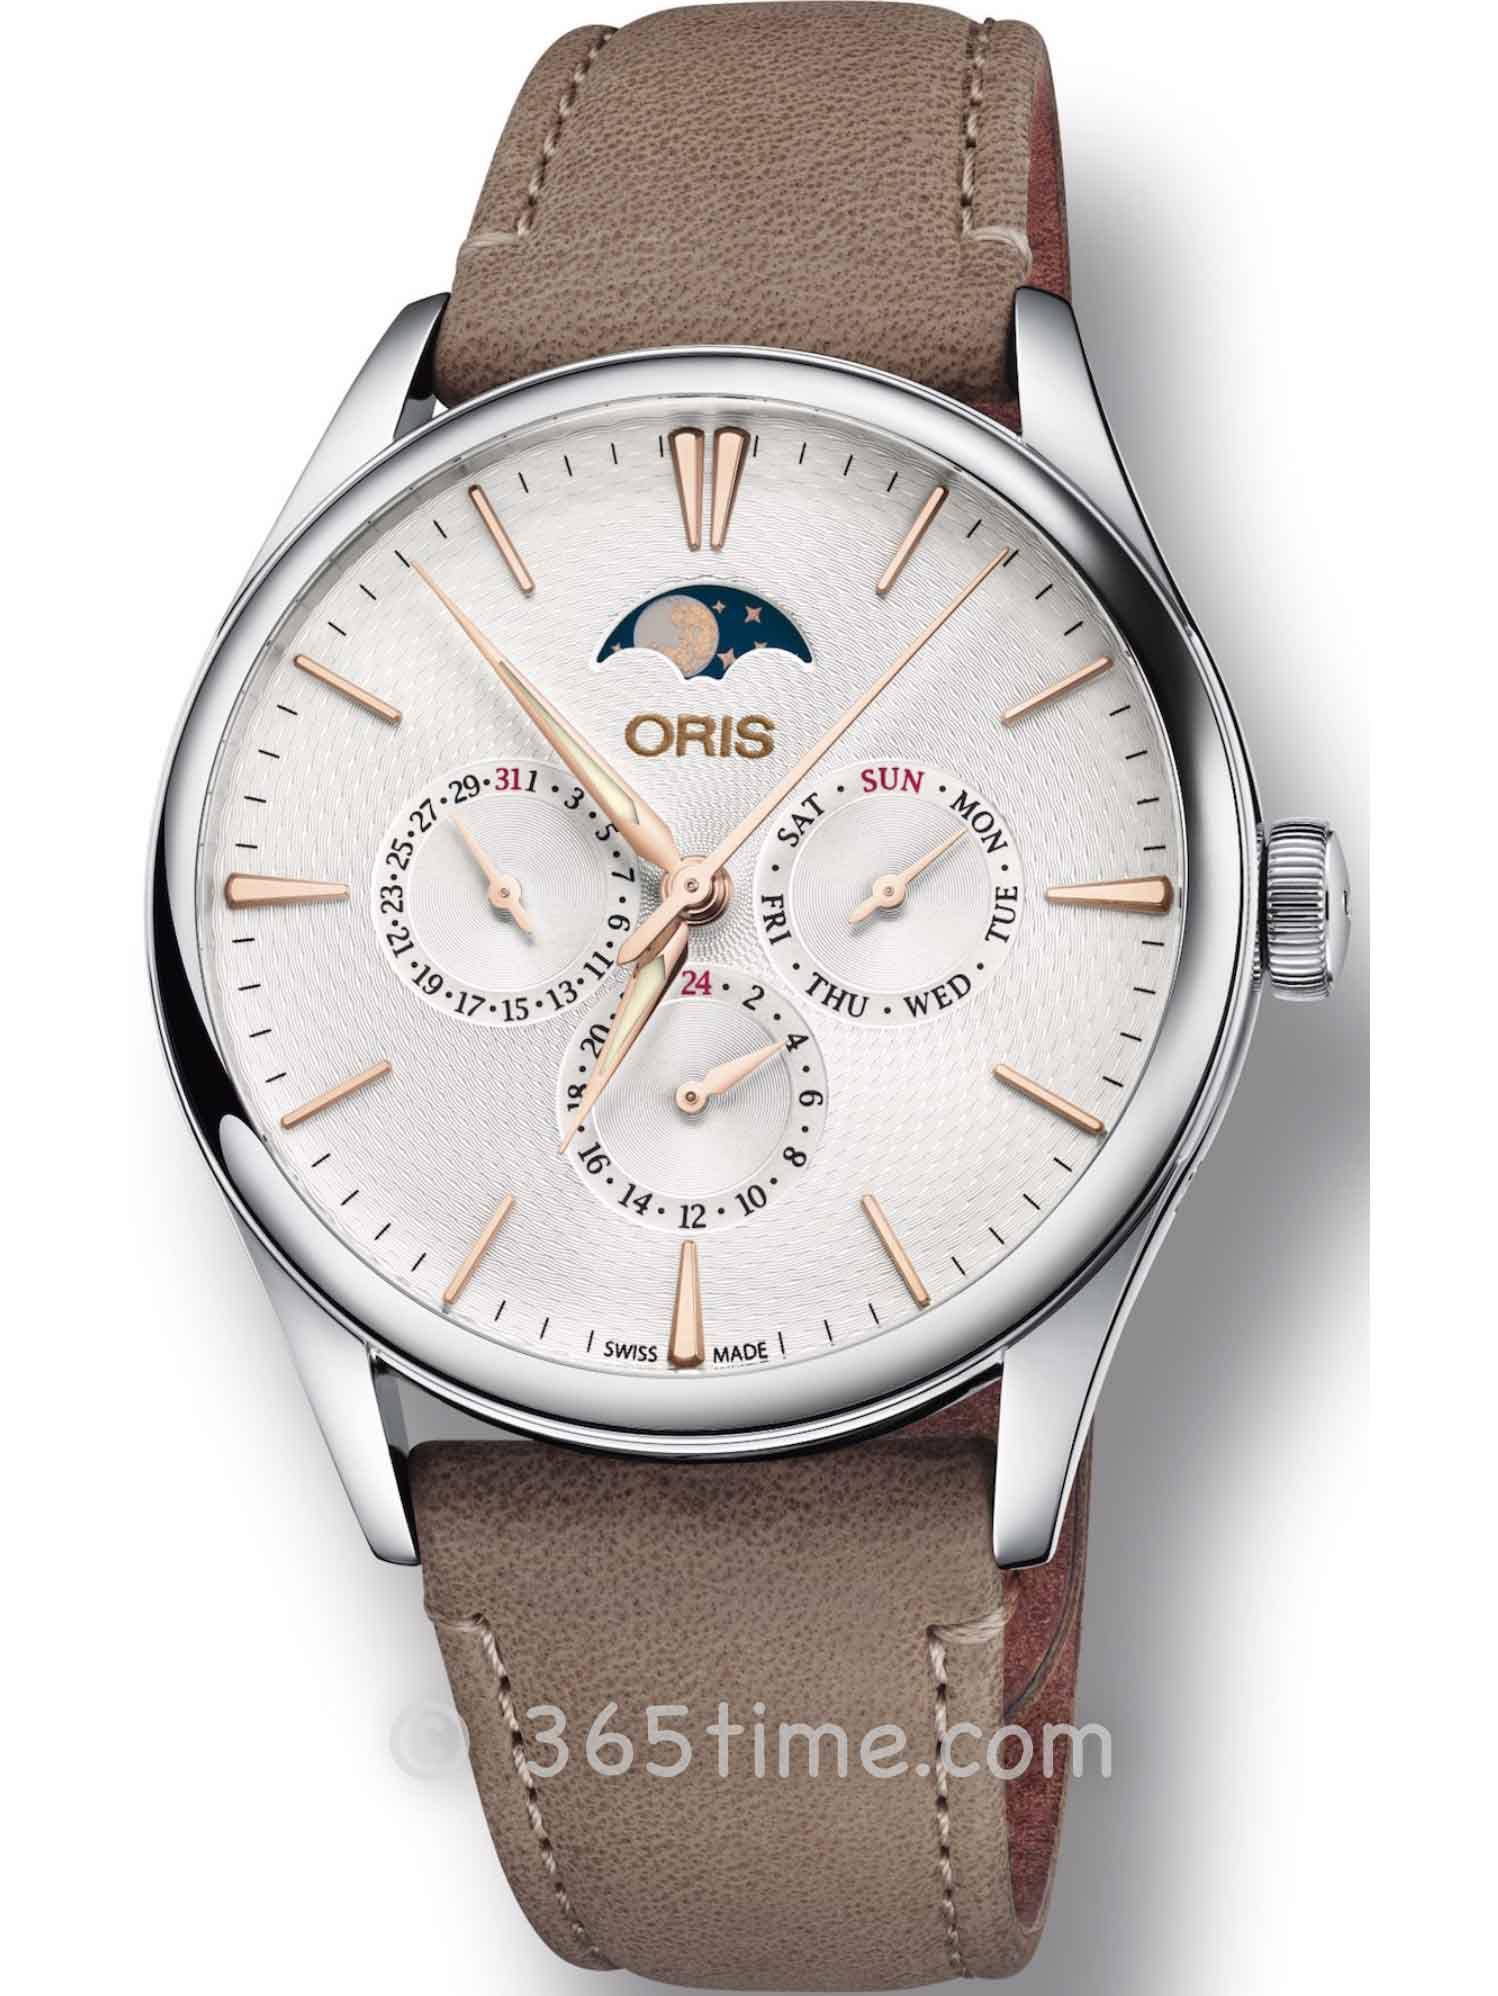 Oris豪利时文化系列天文台日历腕表01 737 7721 4031-07 5 21 32FC